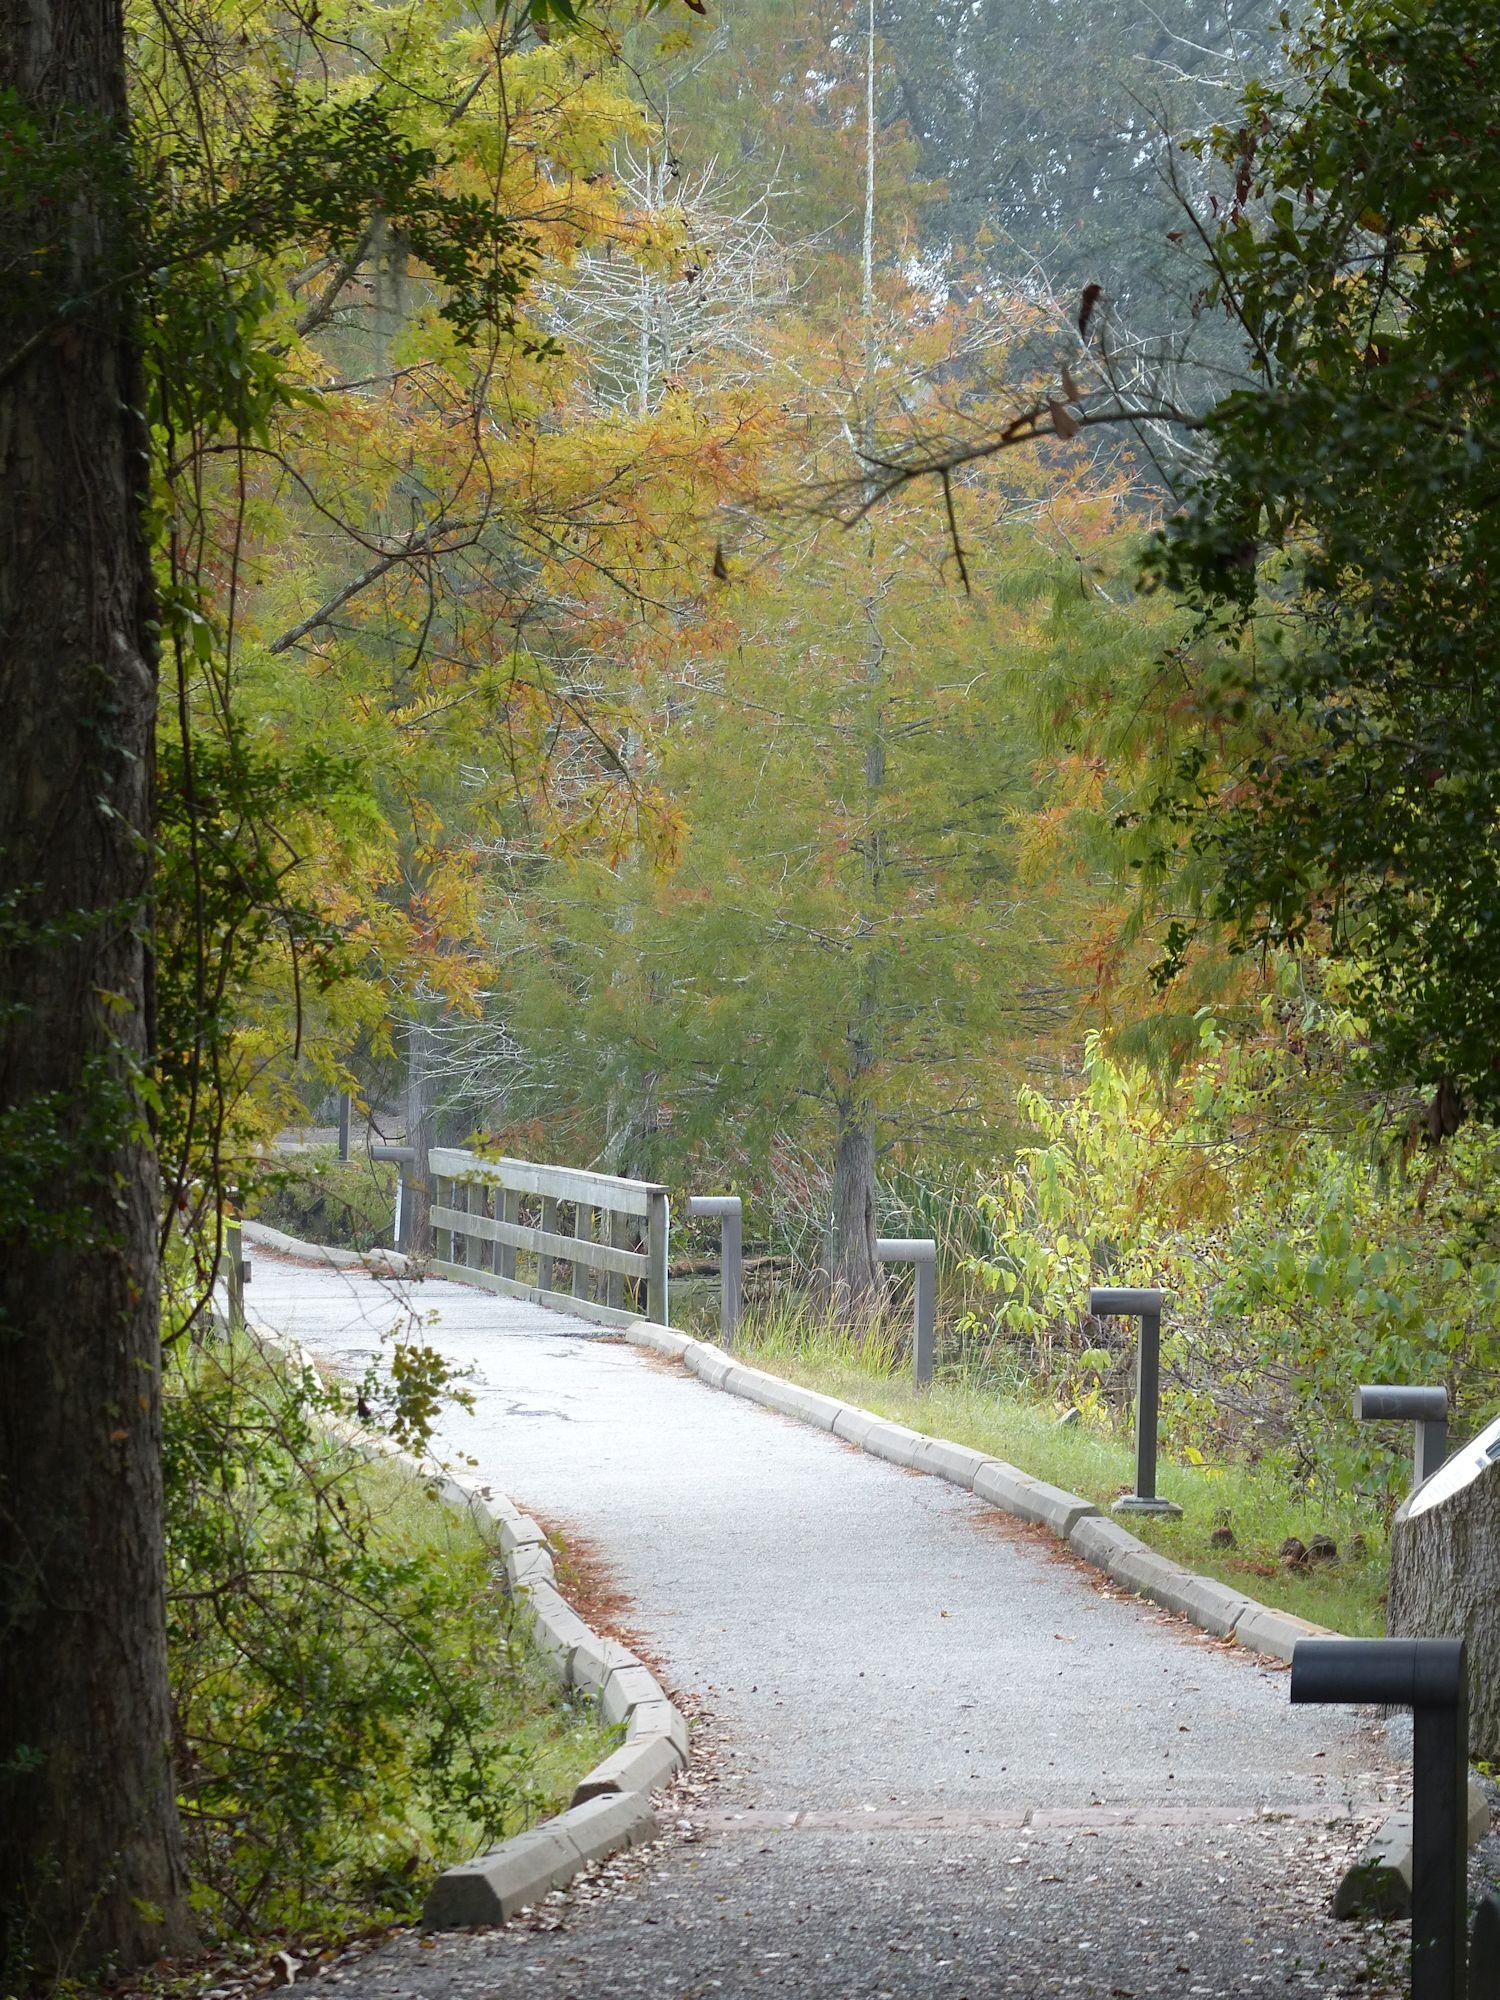 Entrance path to Creekfield Lake.